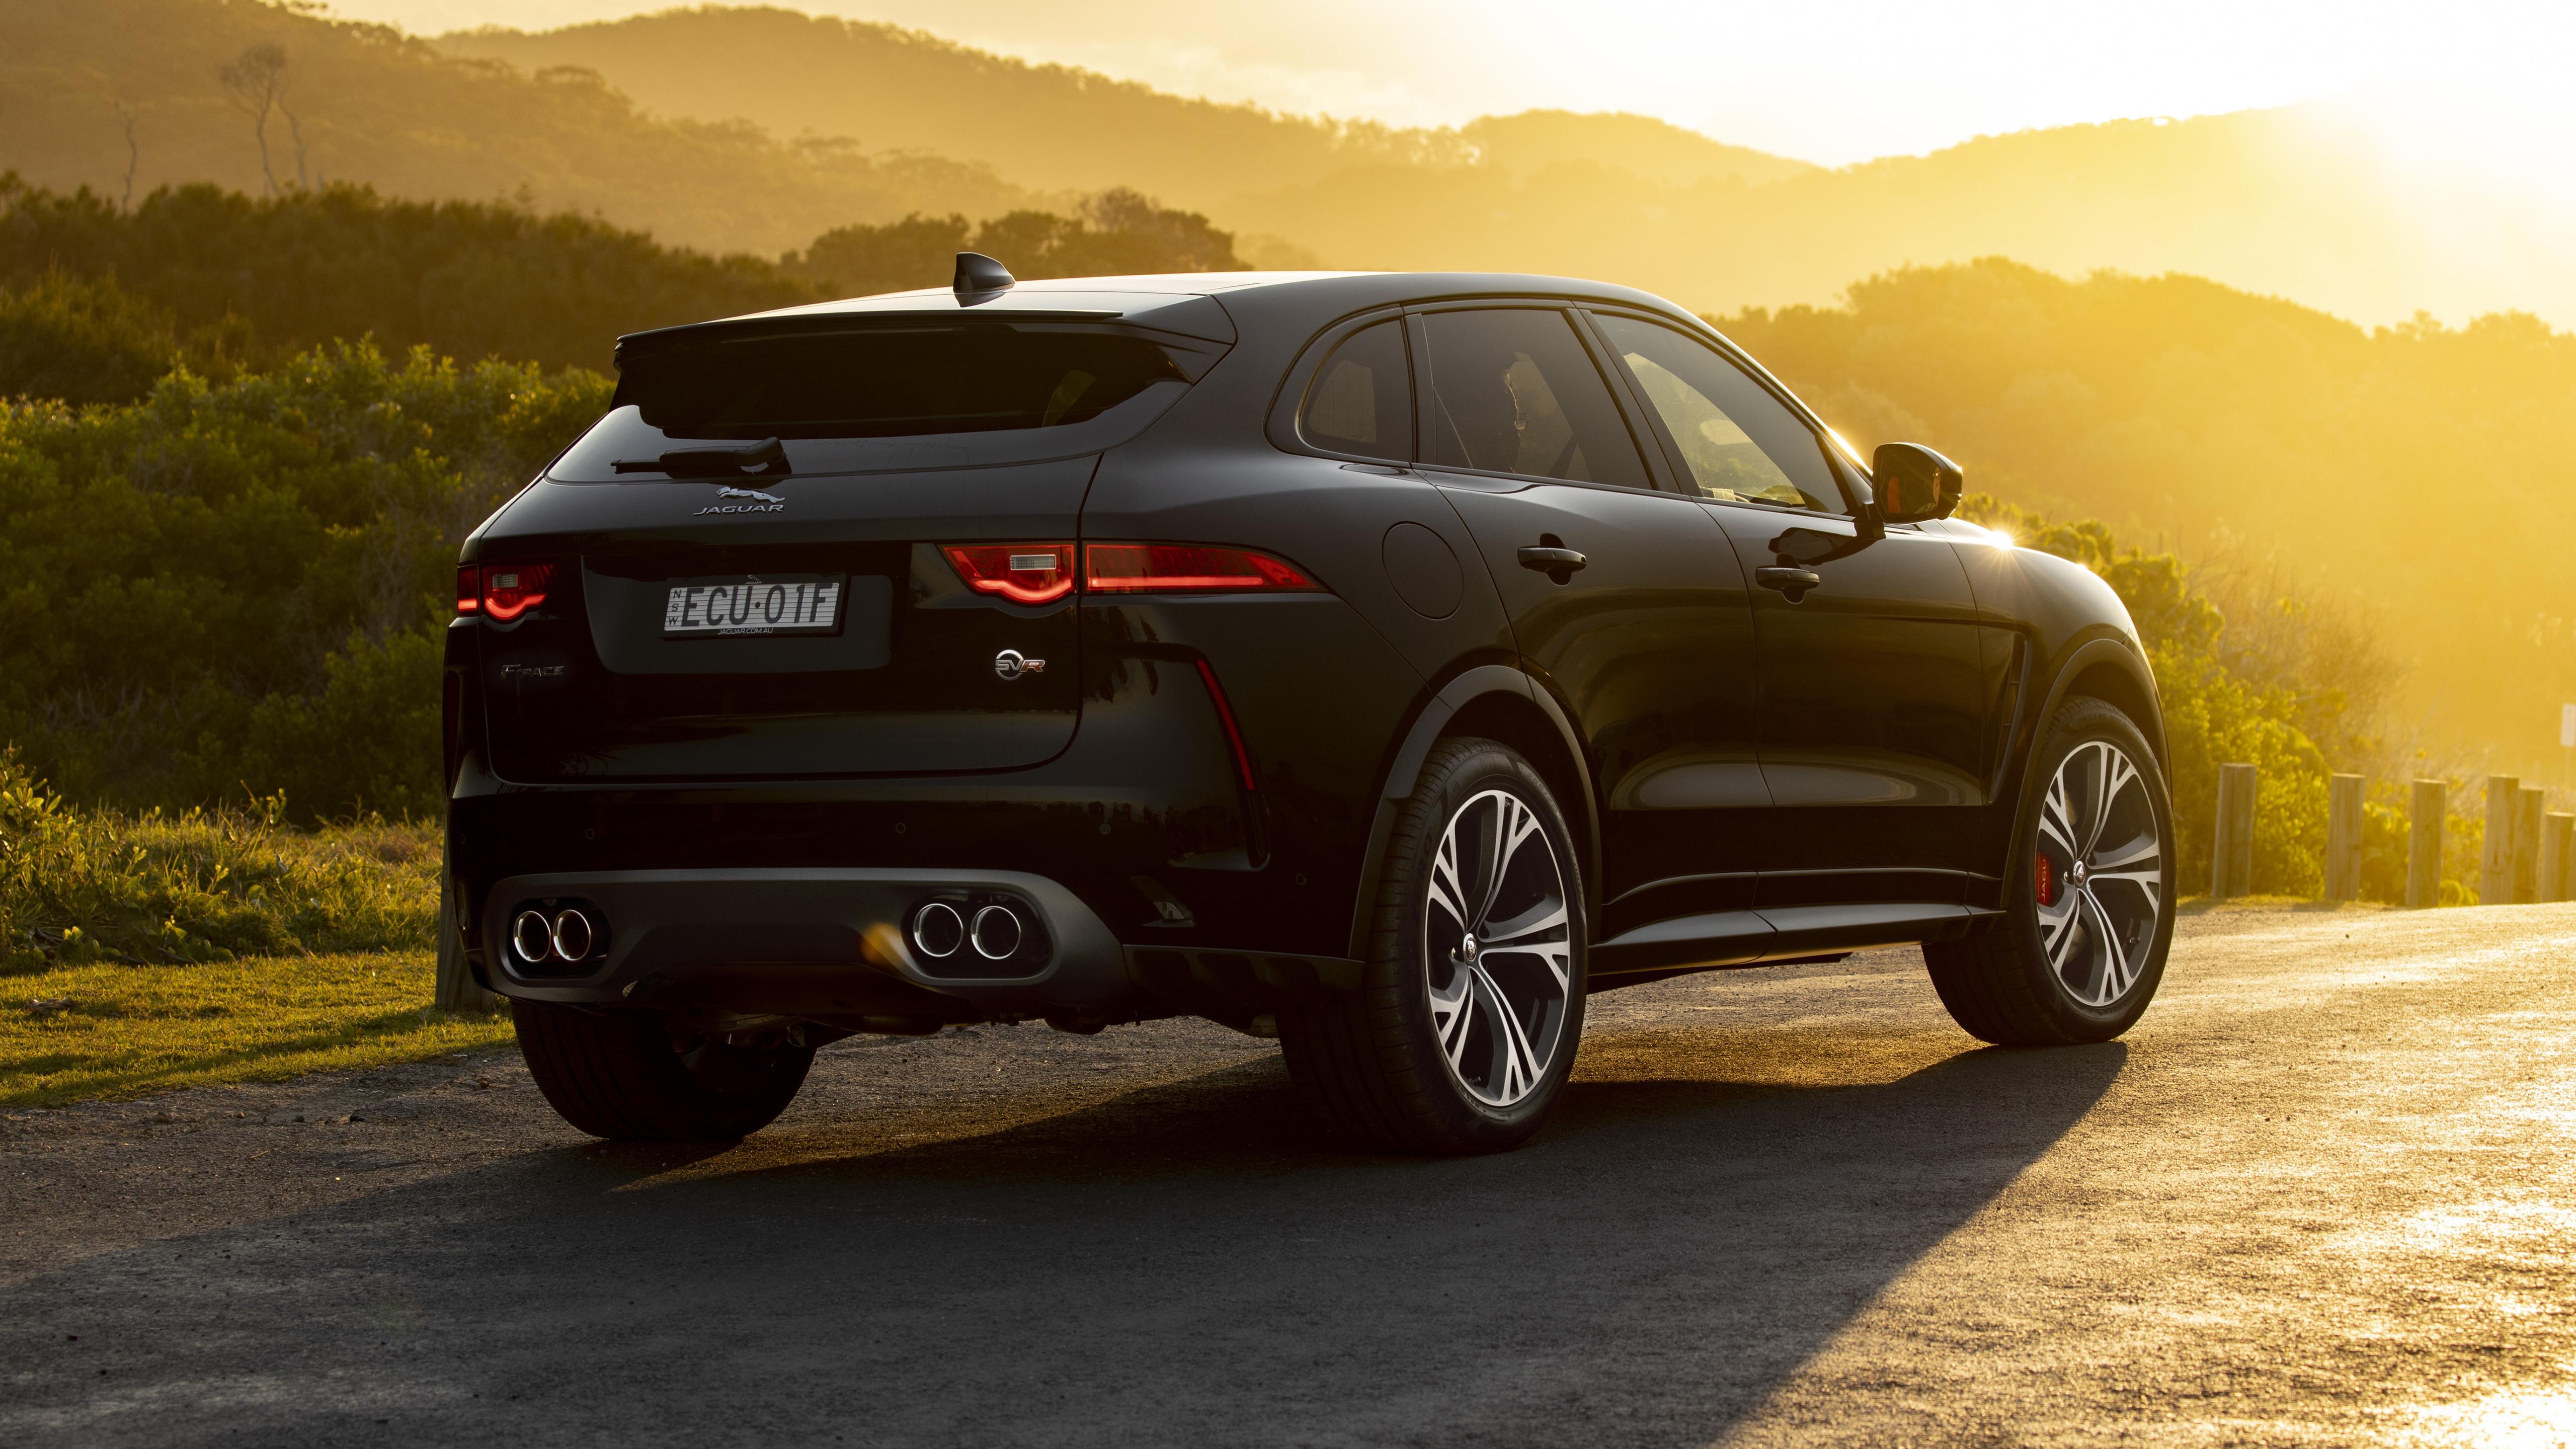 Jaguar F-Pace SVR 2019 5K 2 Wallpaper | HD Car Wallpapers ...